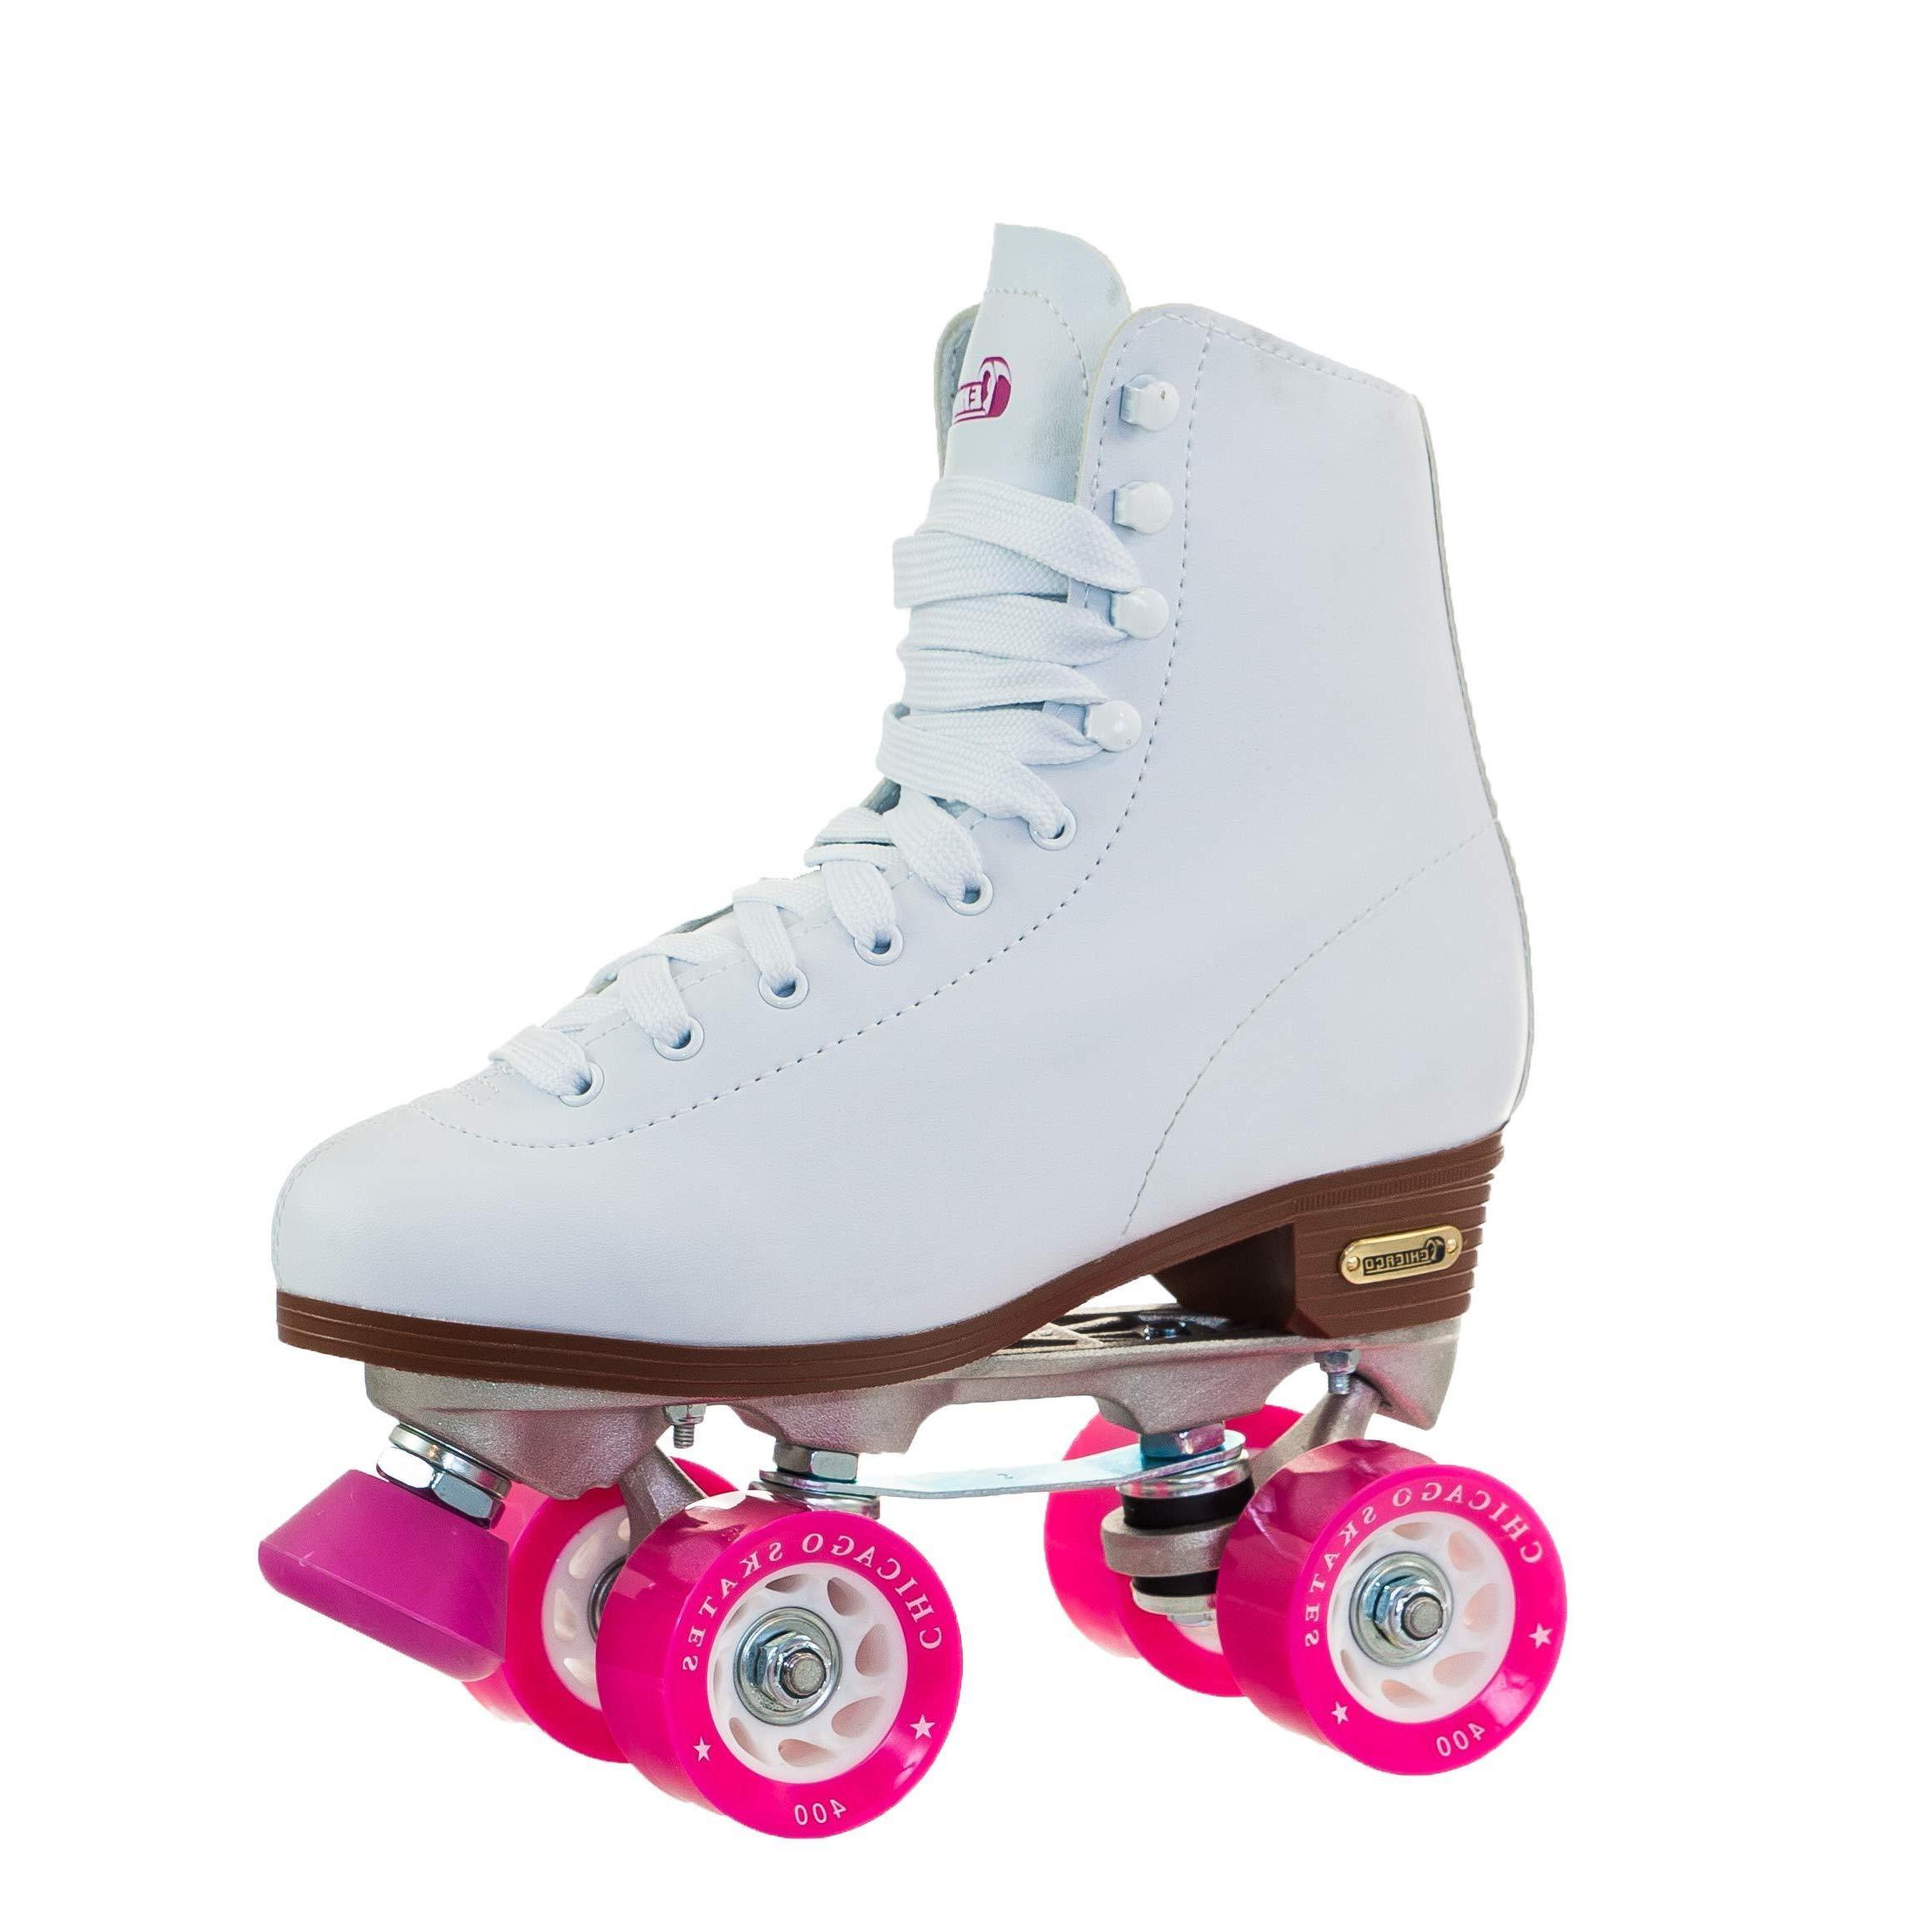 chicago womens classic roller skates white rink